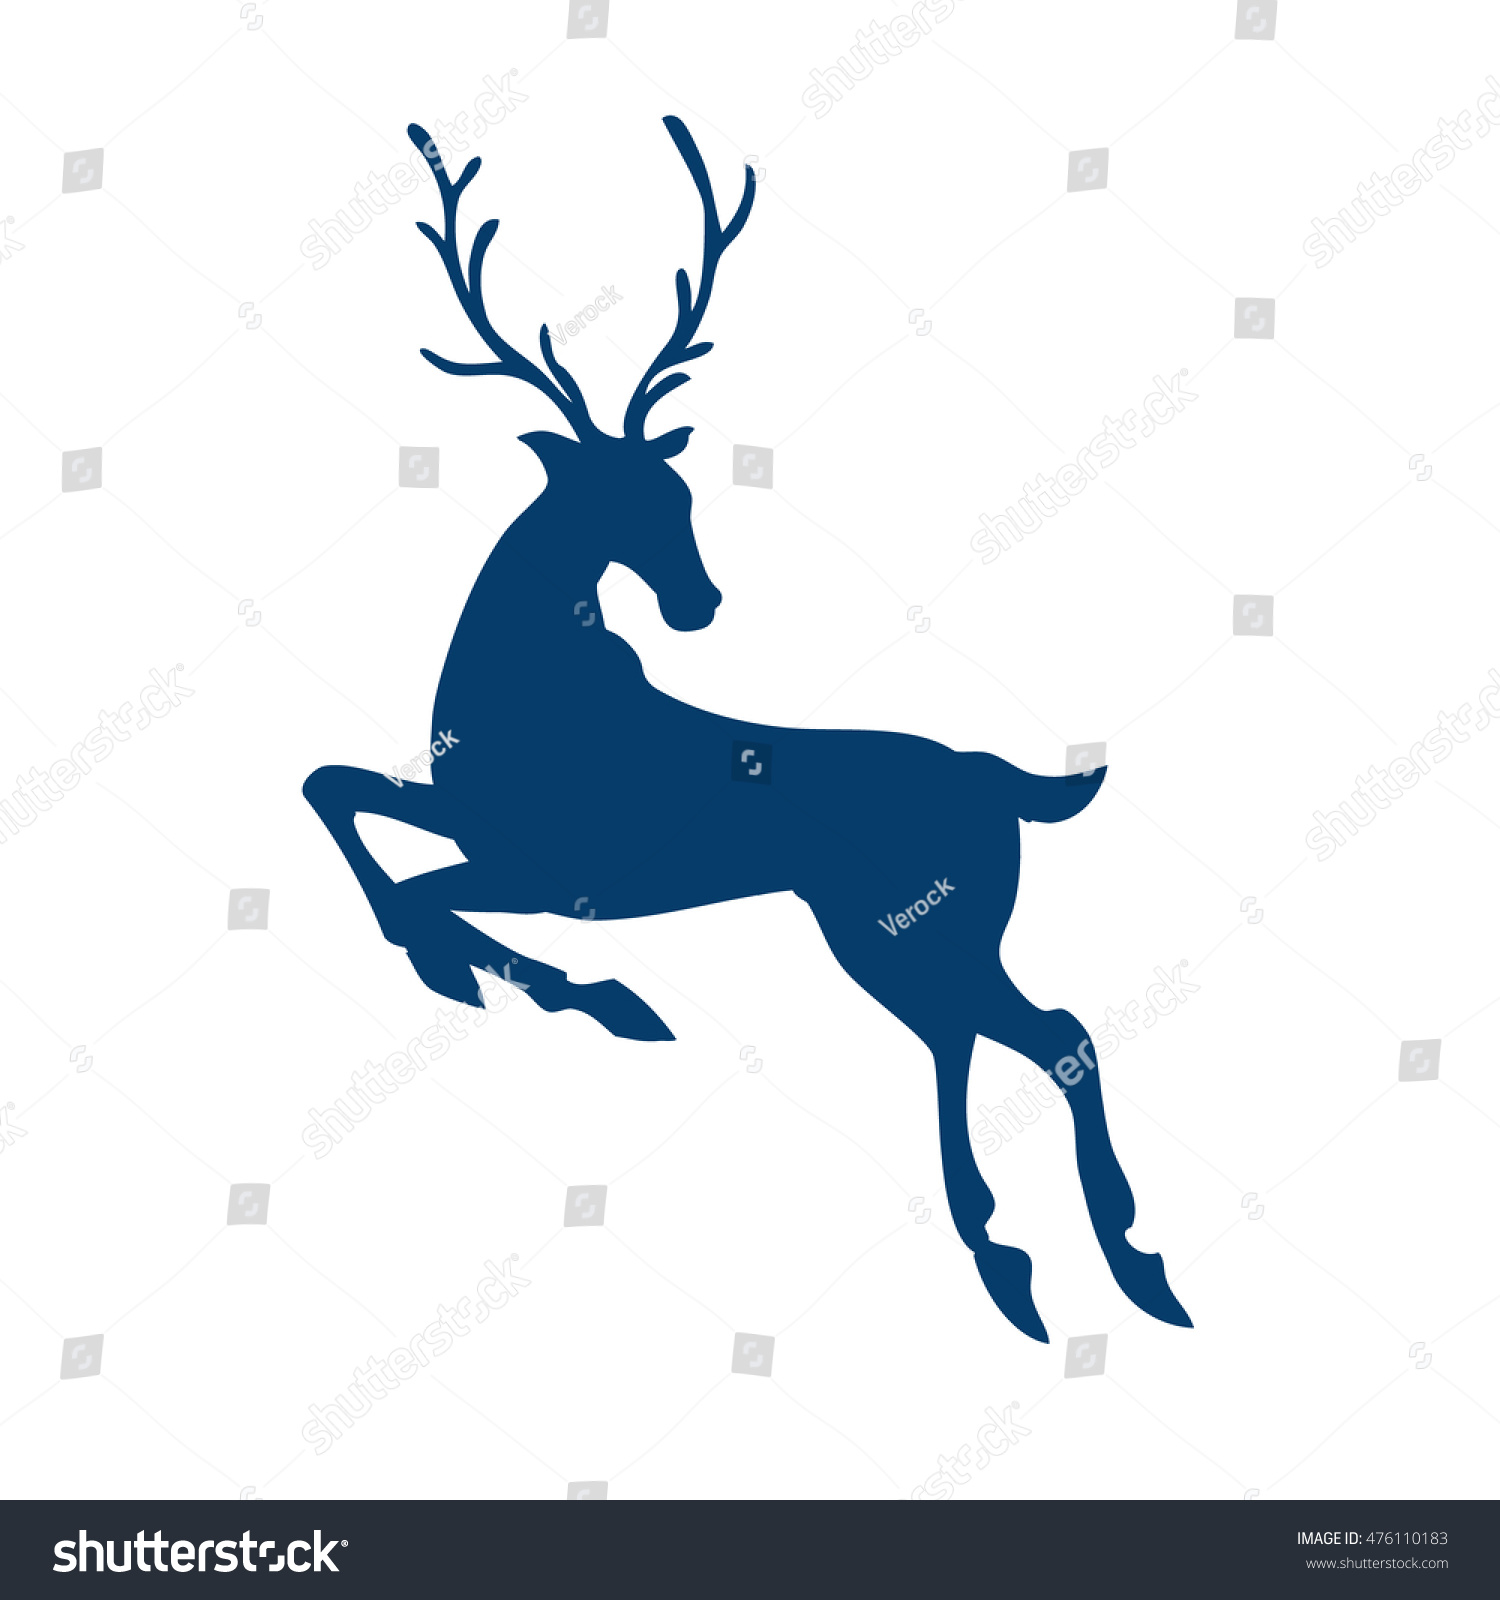 silhouette of running deer isolated on white background side view art raster illustration